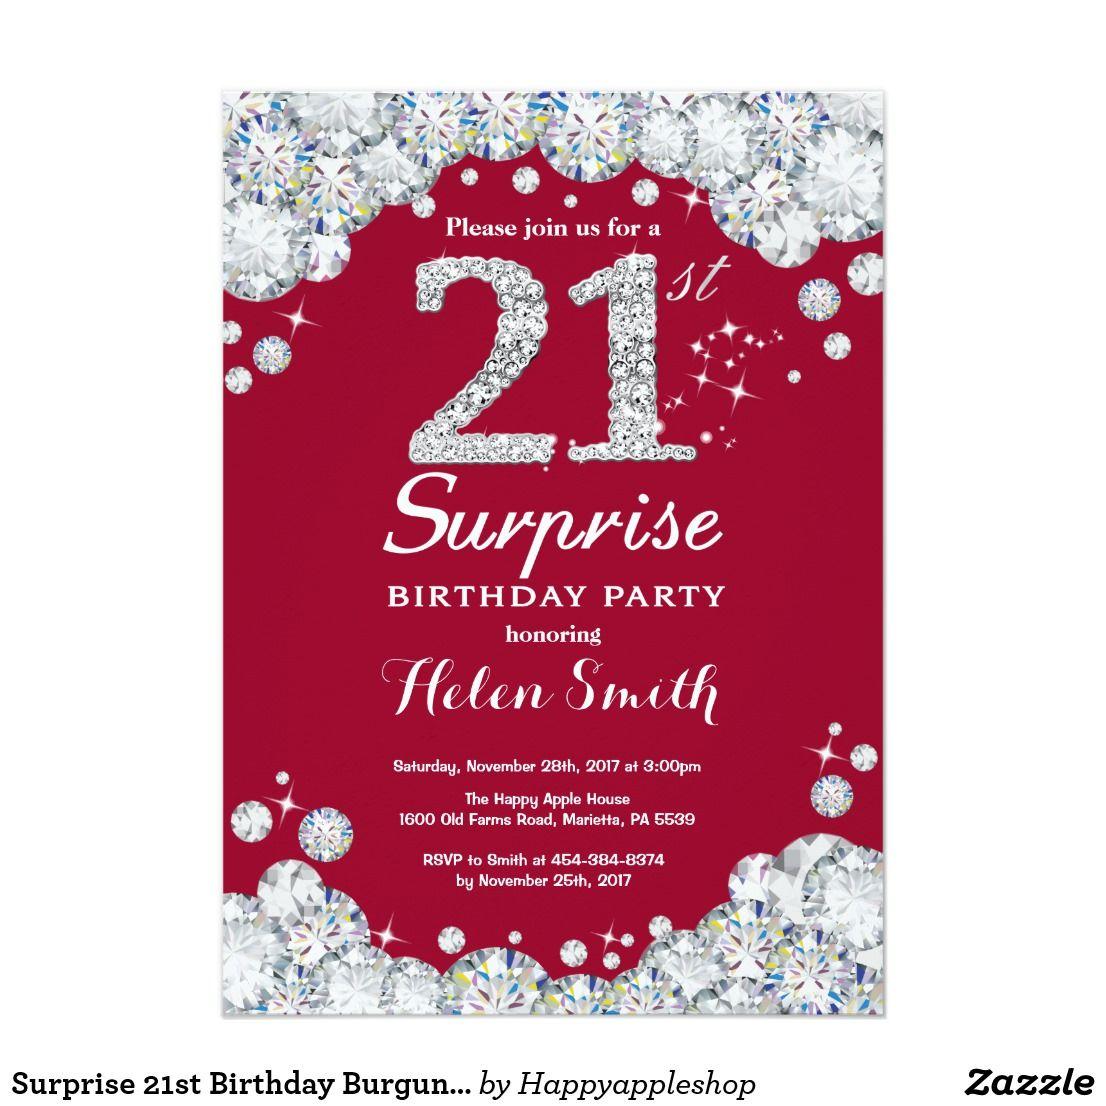 Surprise 21st Birthday Burgundy Red Silver Diamond Invitation ...